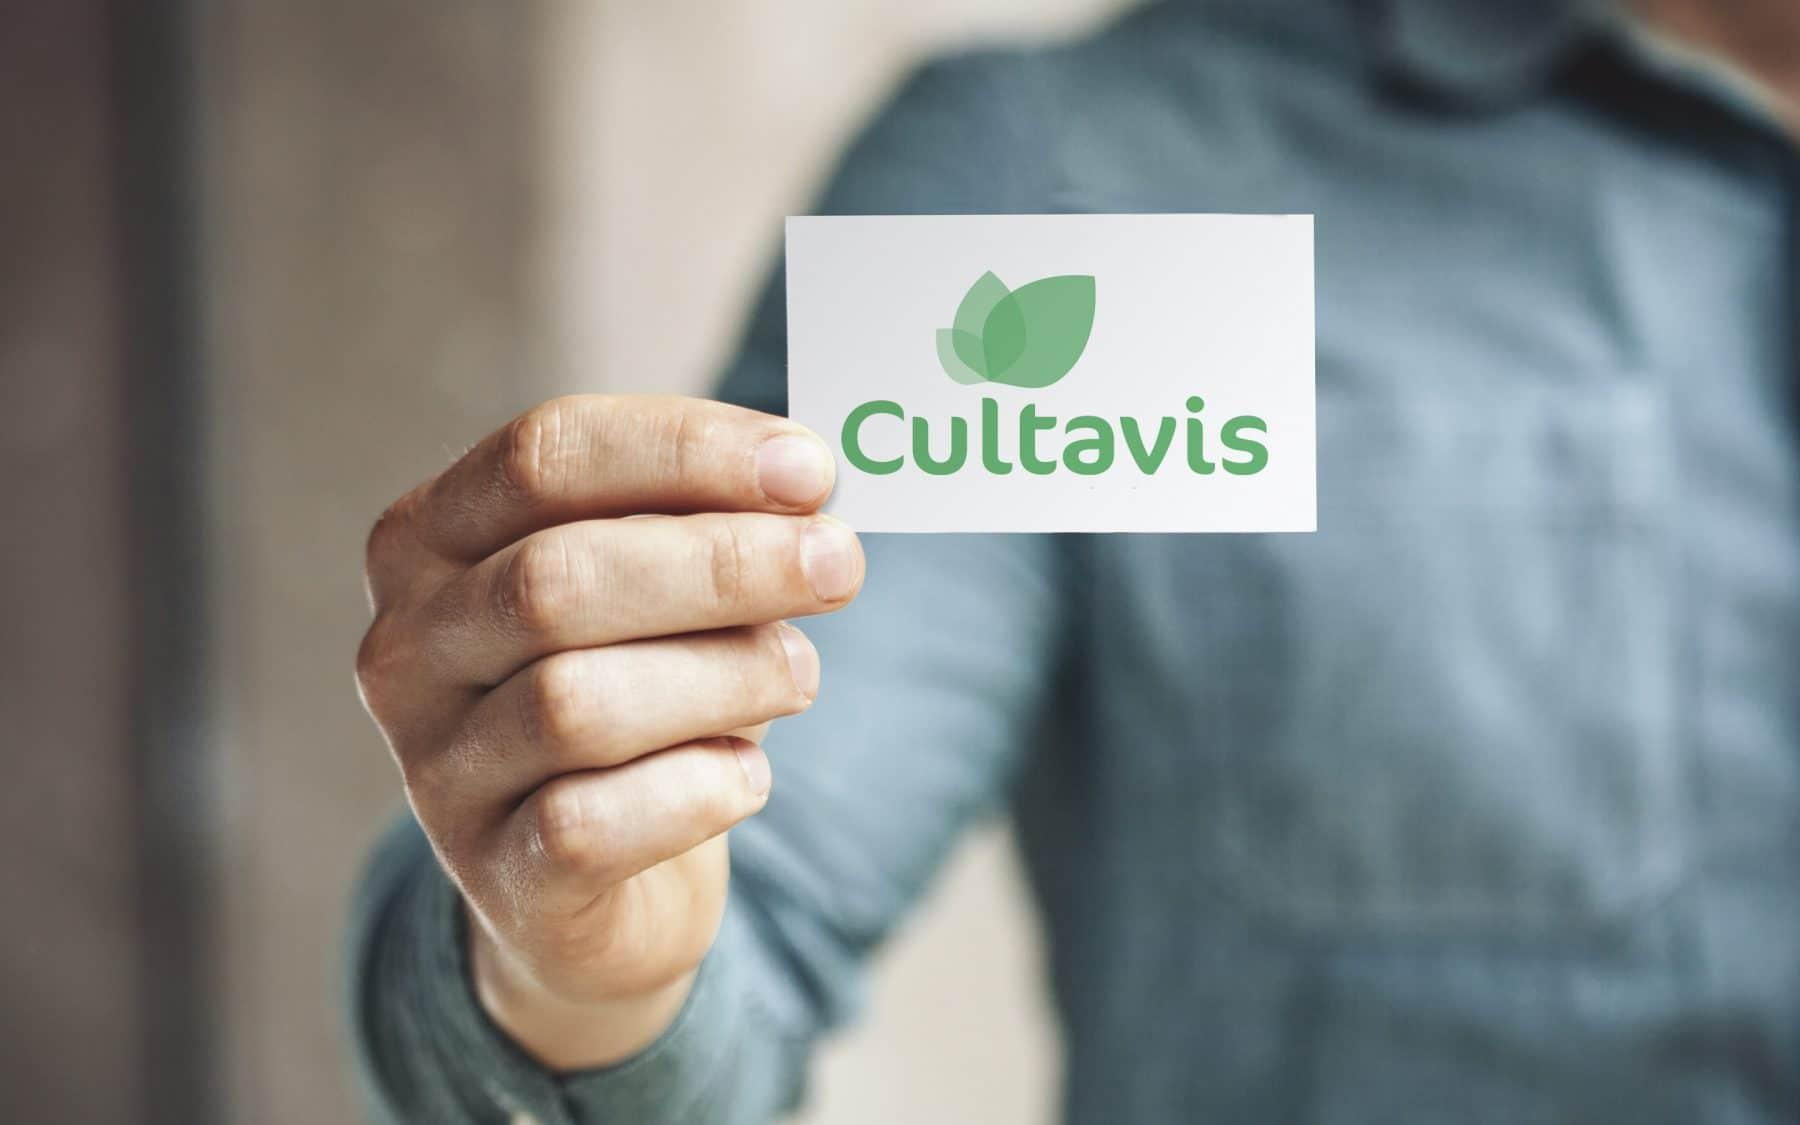 Cultavis